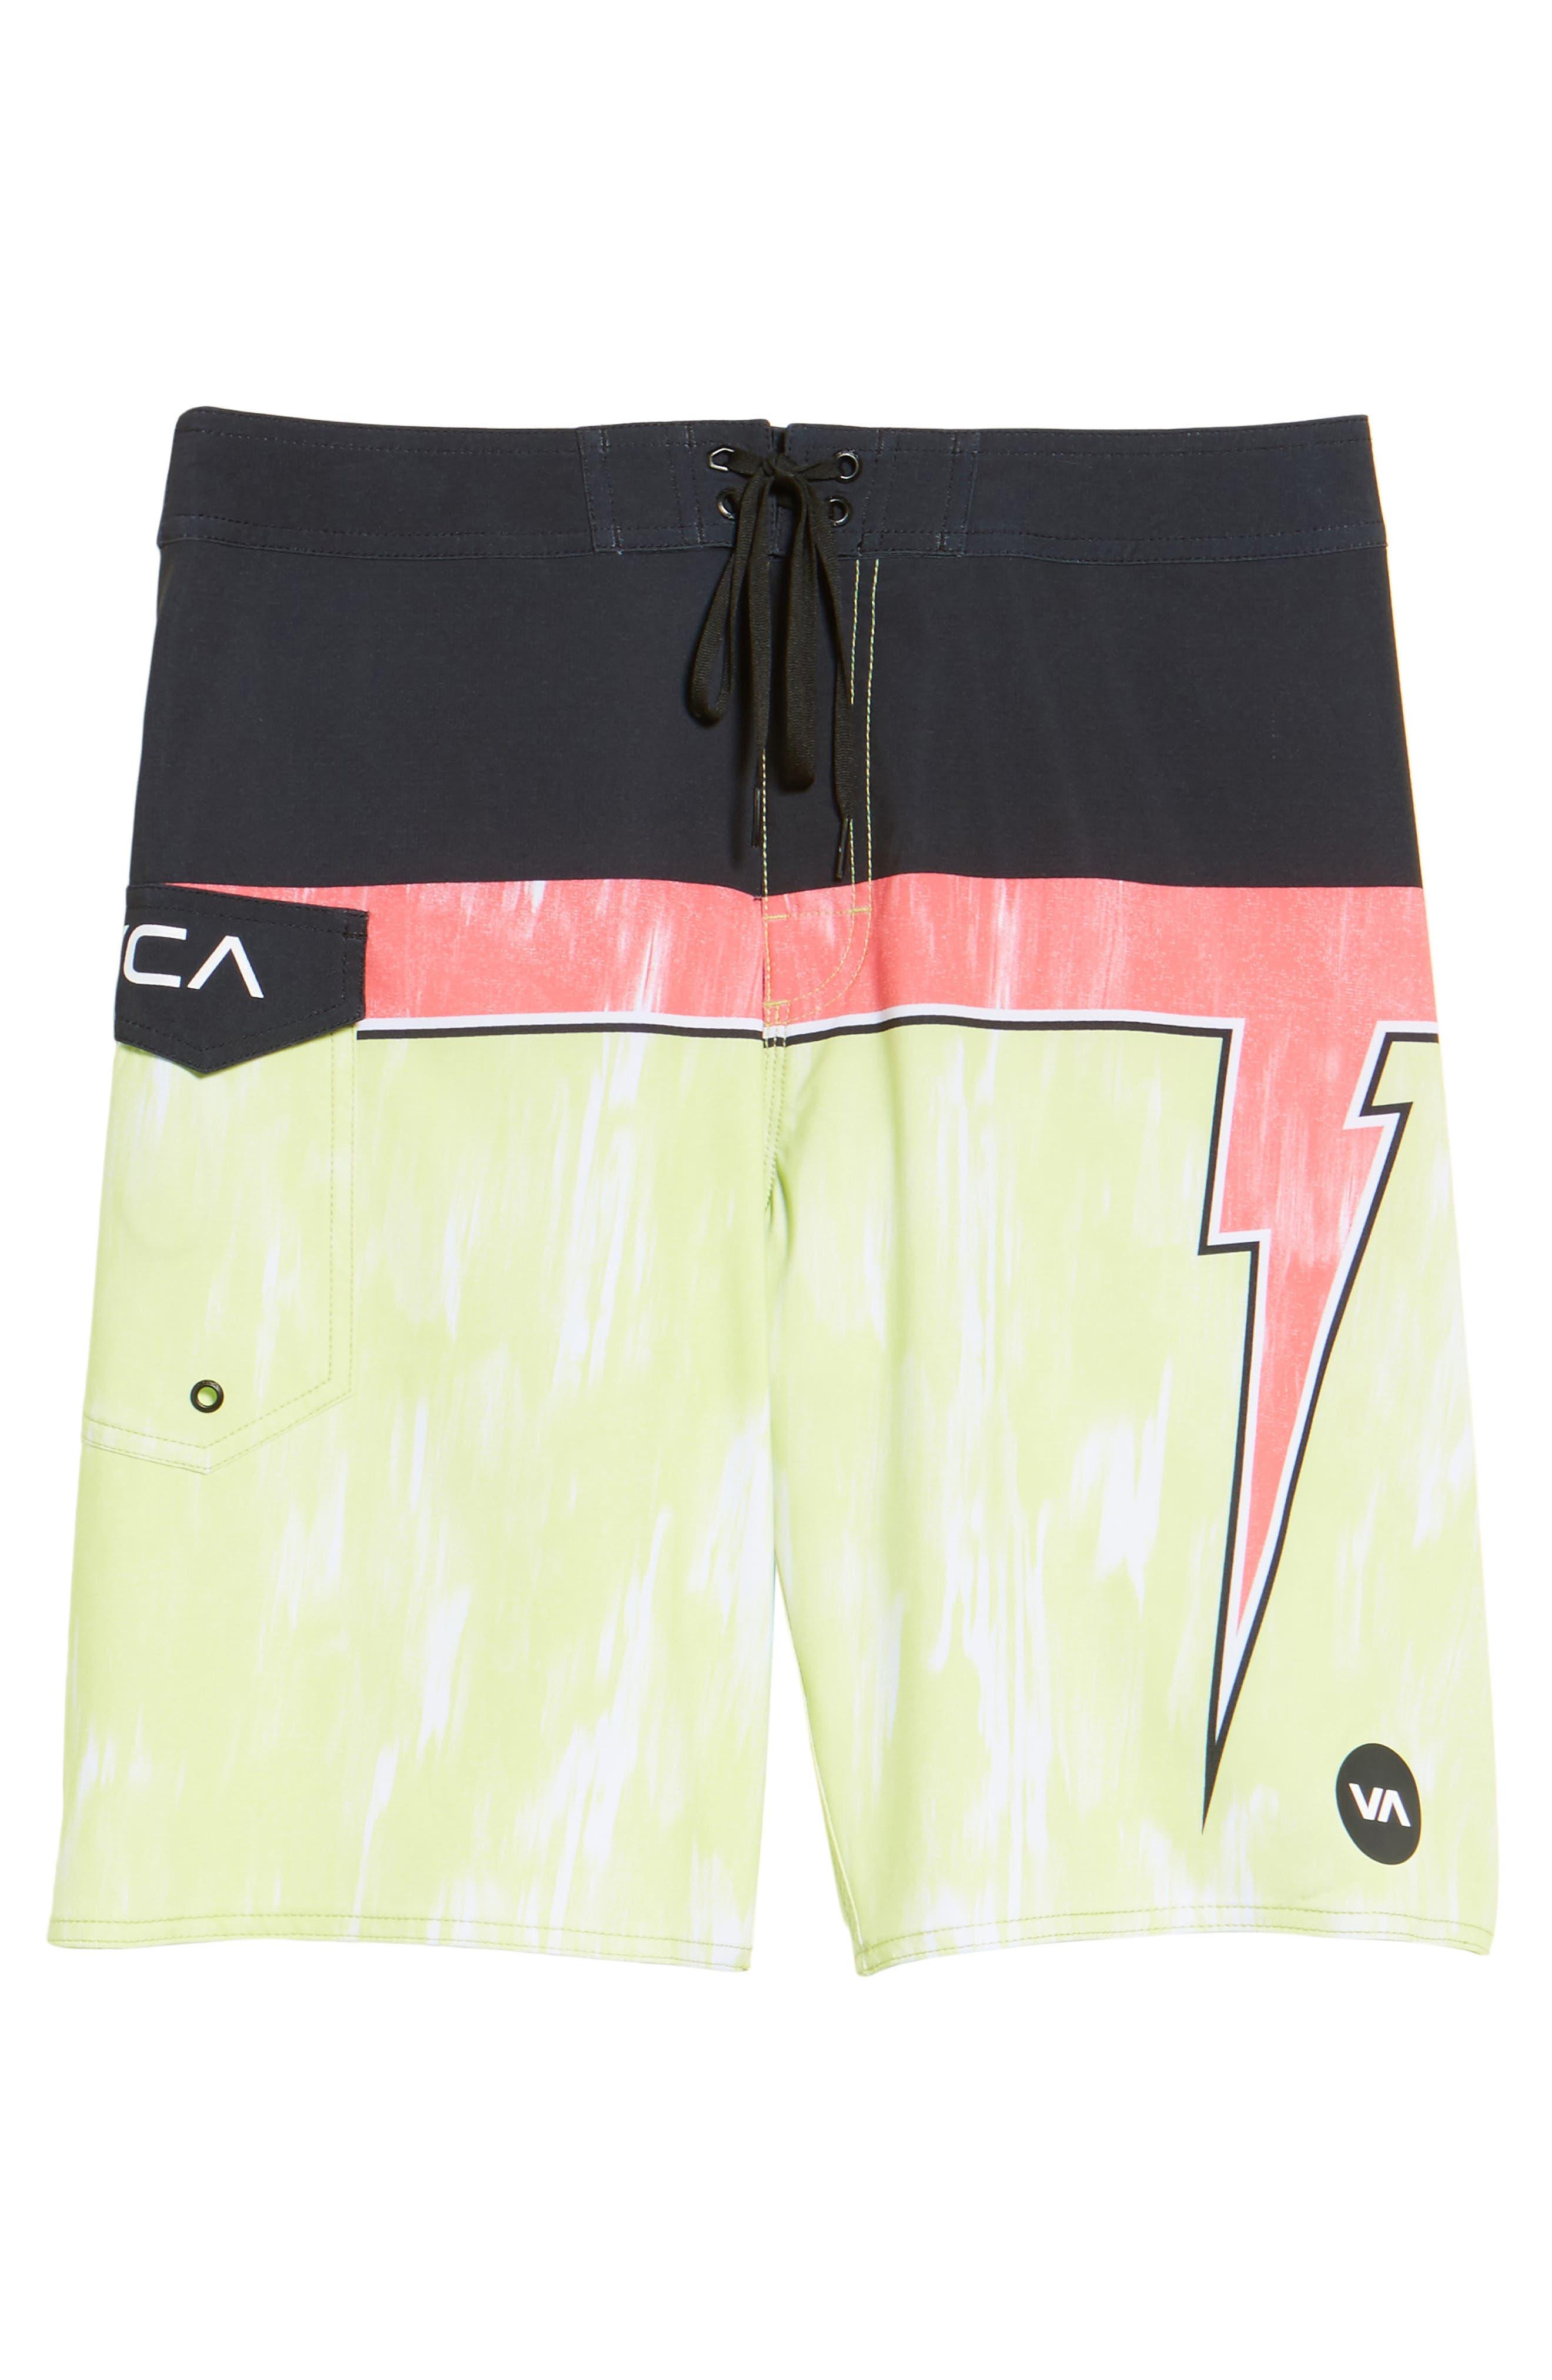 Makua Bolt Board Shorts,                             Alternate thumbnail 6, color,                             Yellow Fade